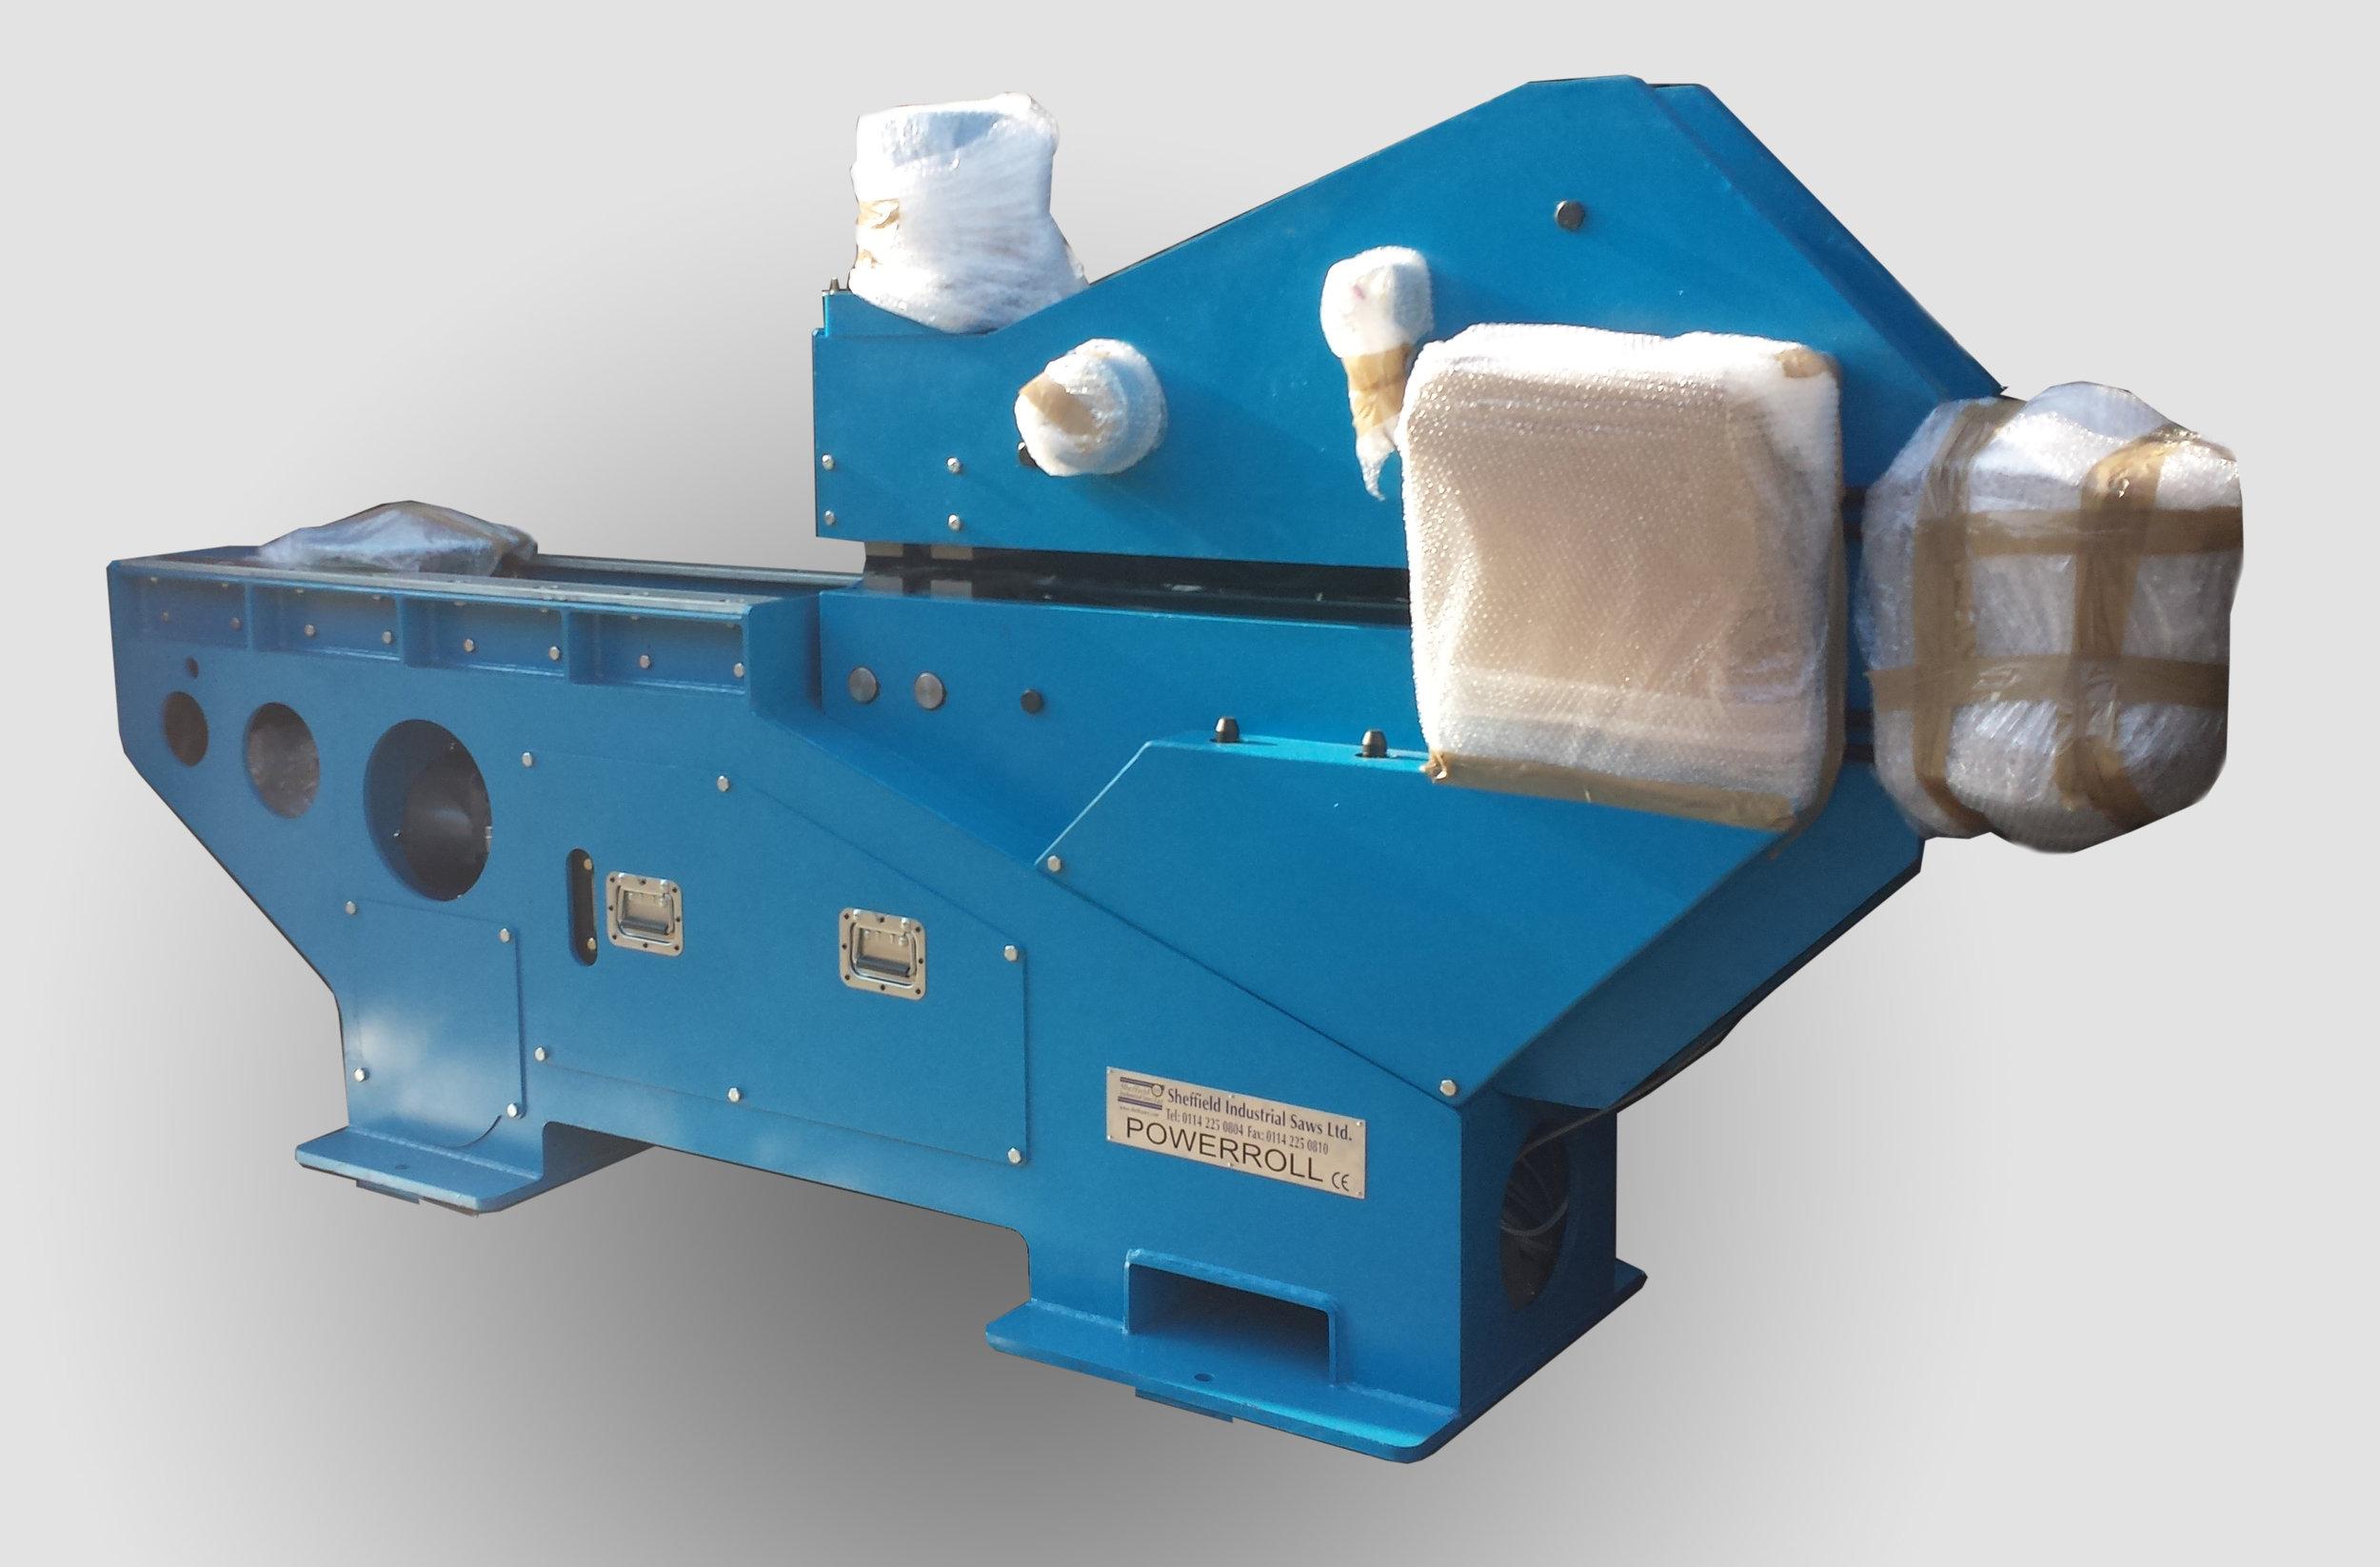 POWERROLL saw blade repair machinery